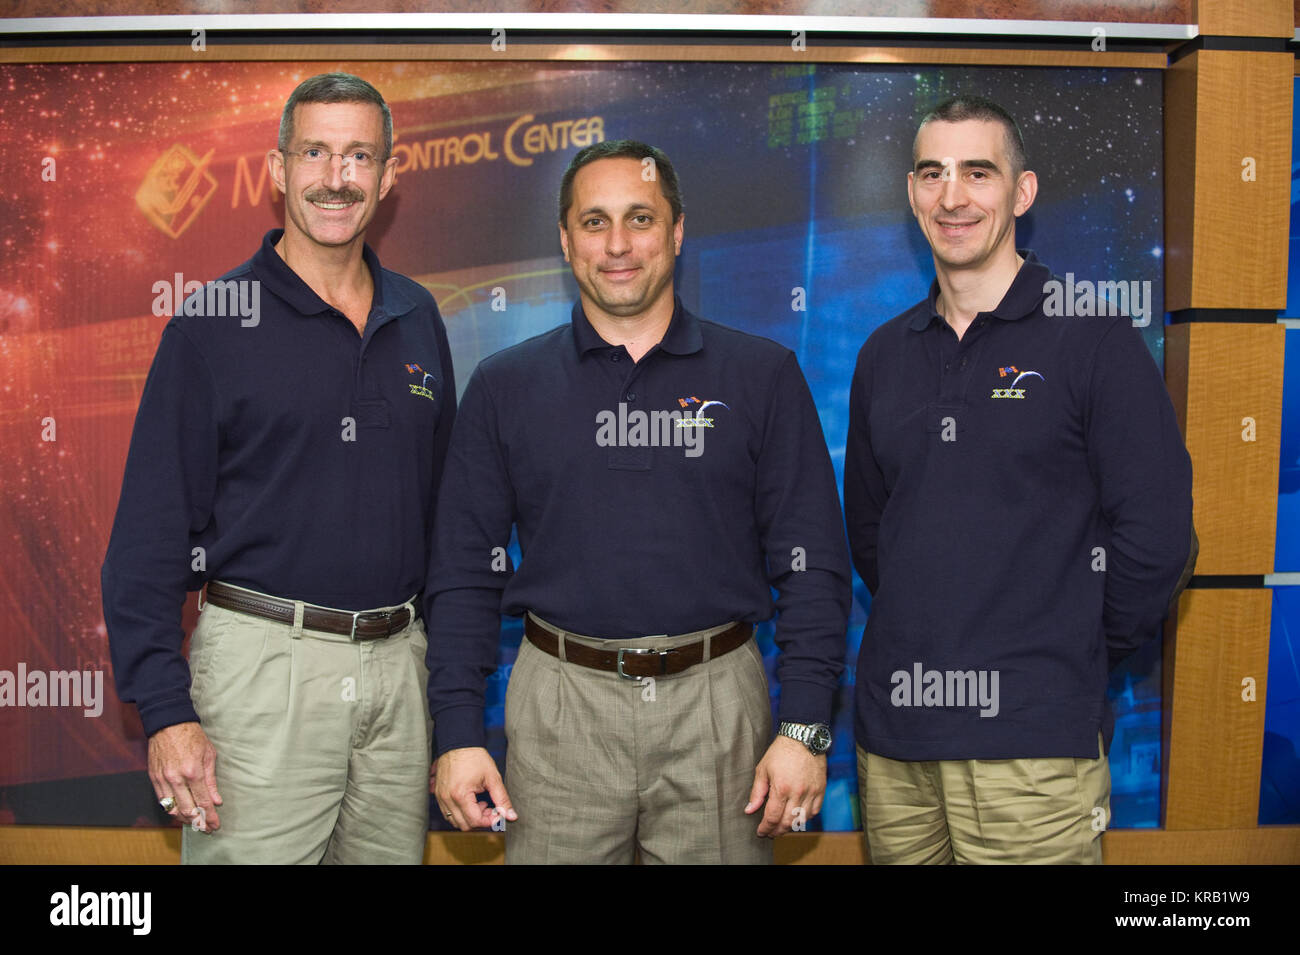 PHOTO DATE: 27 July 2011 LOCATION: Bldg. 2N Press Conference Room SUBJECT: Expedition 29 Press Conference PHOTOGRAPHER: - Stock Image